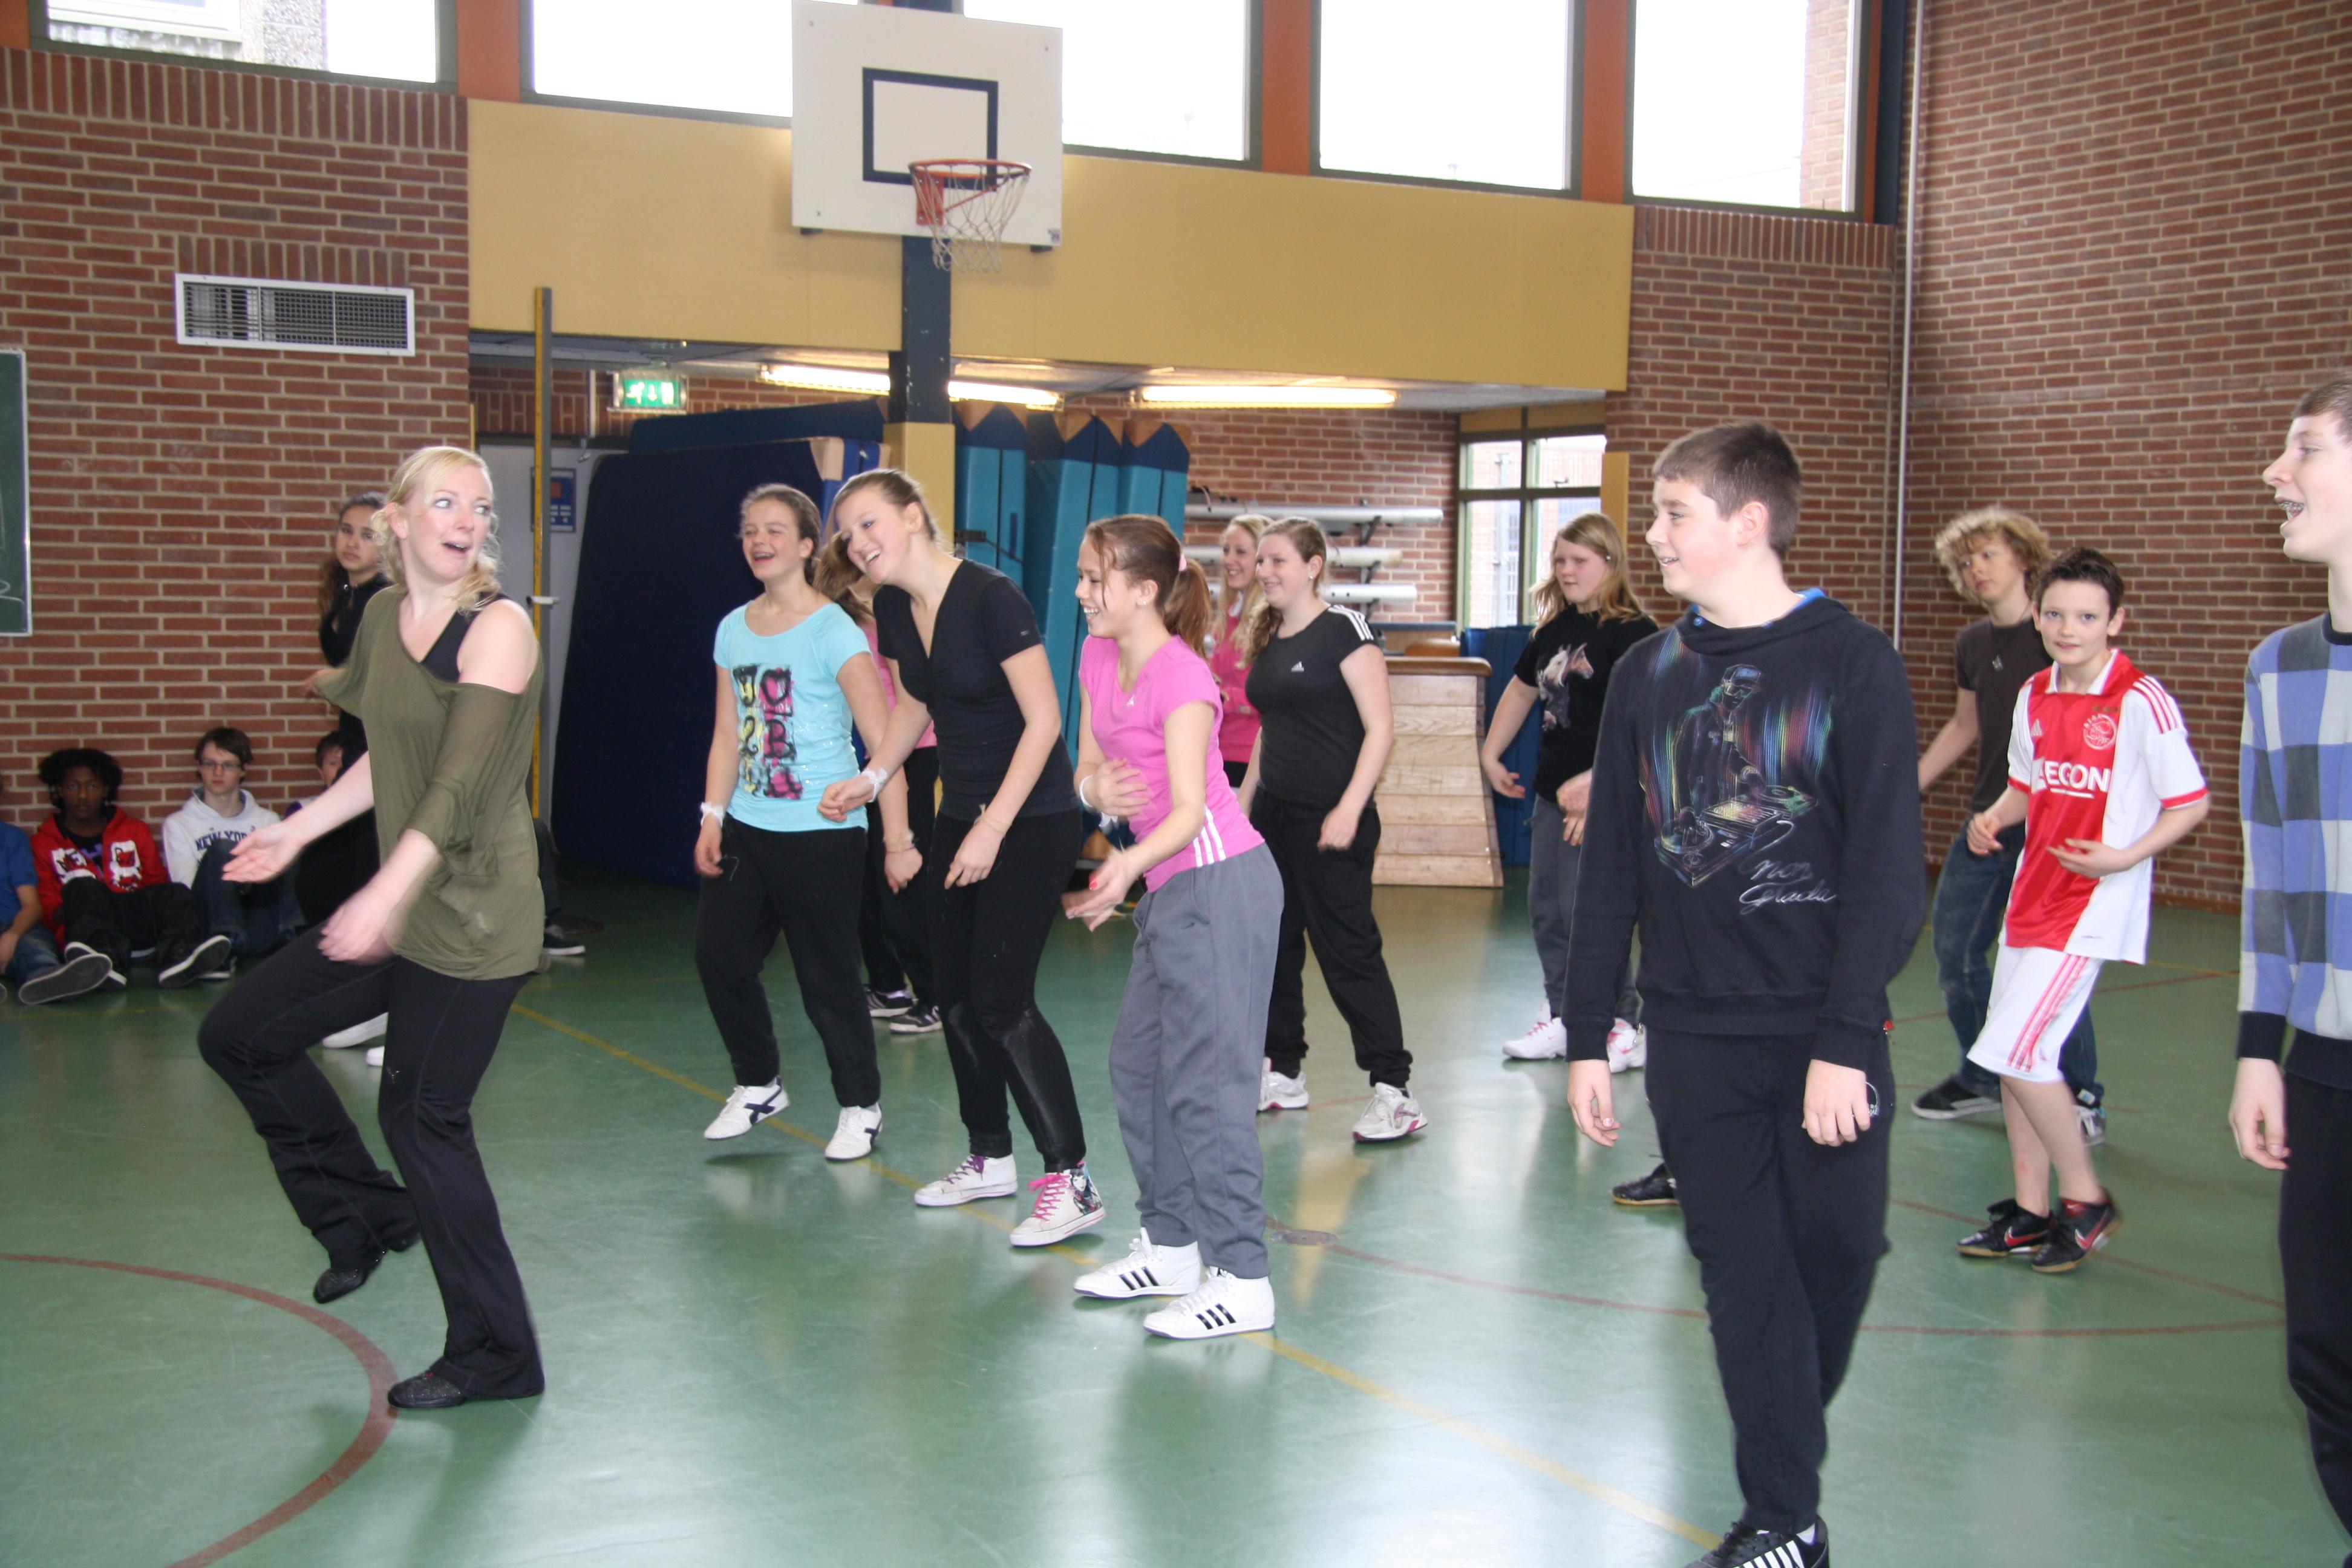 dancebattel 2